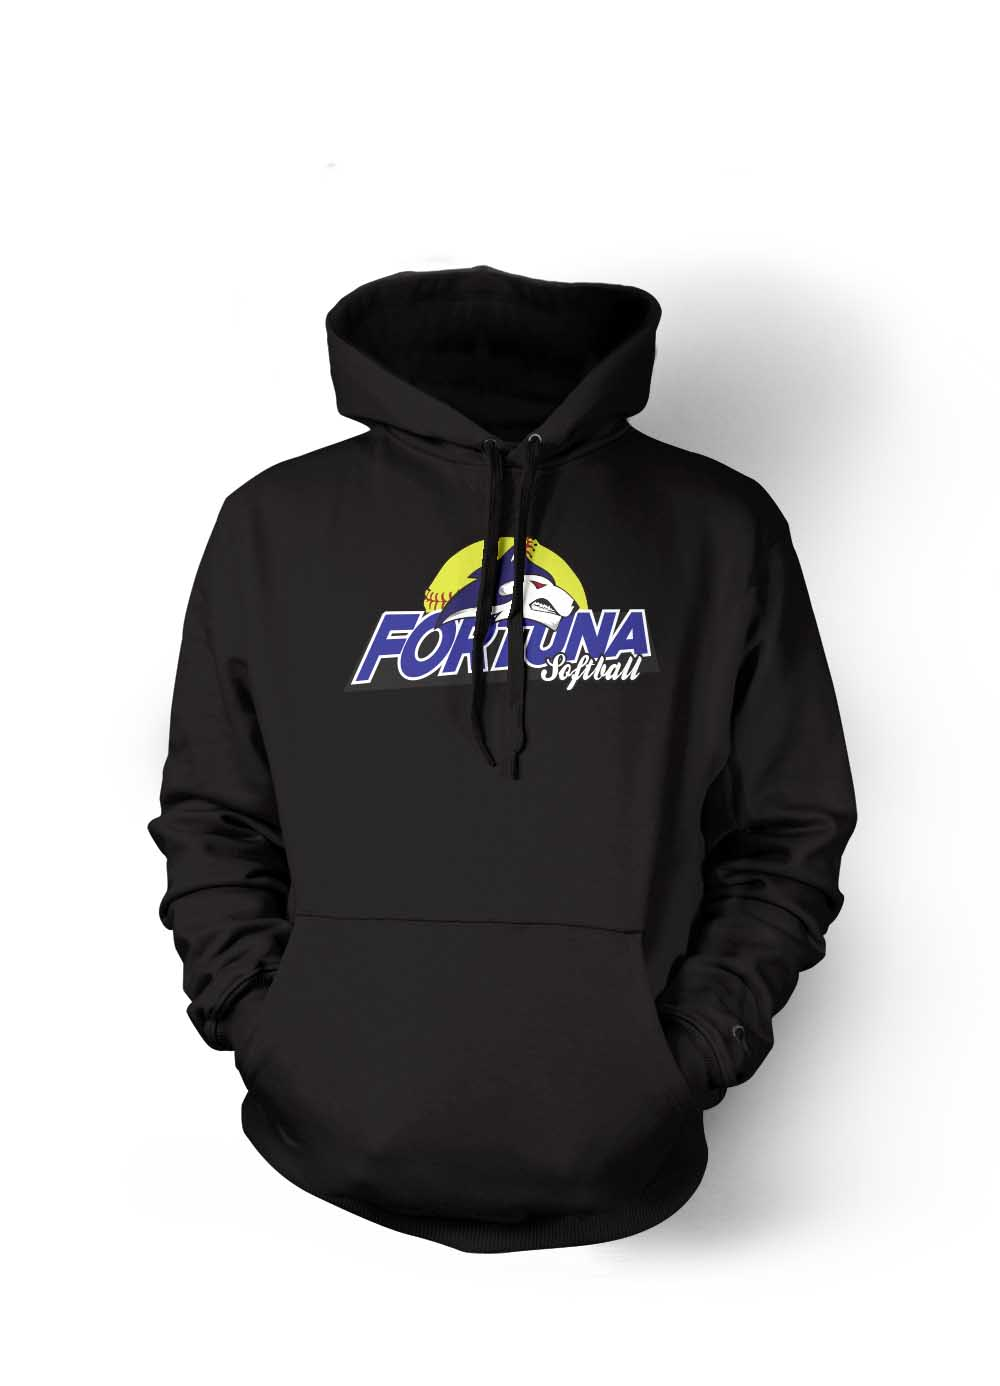 Fortuna Softball mock 2.jpg